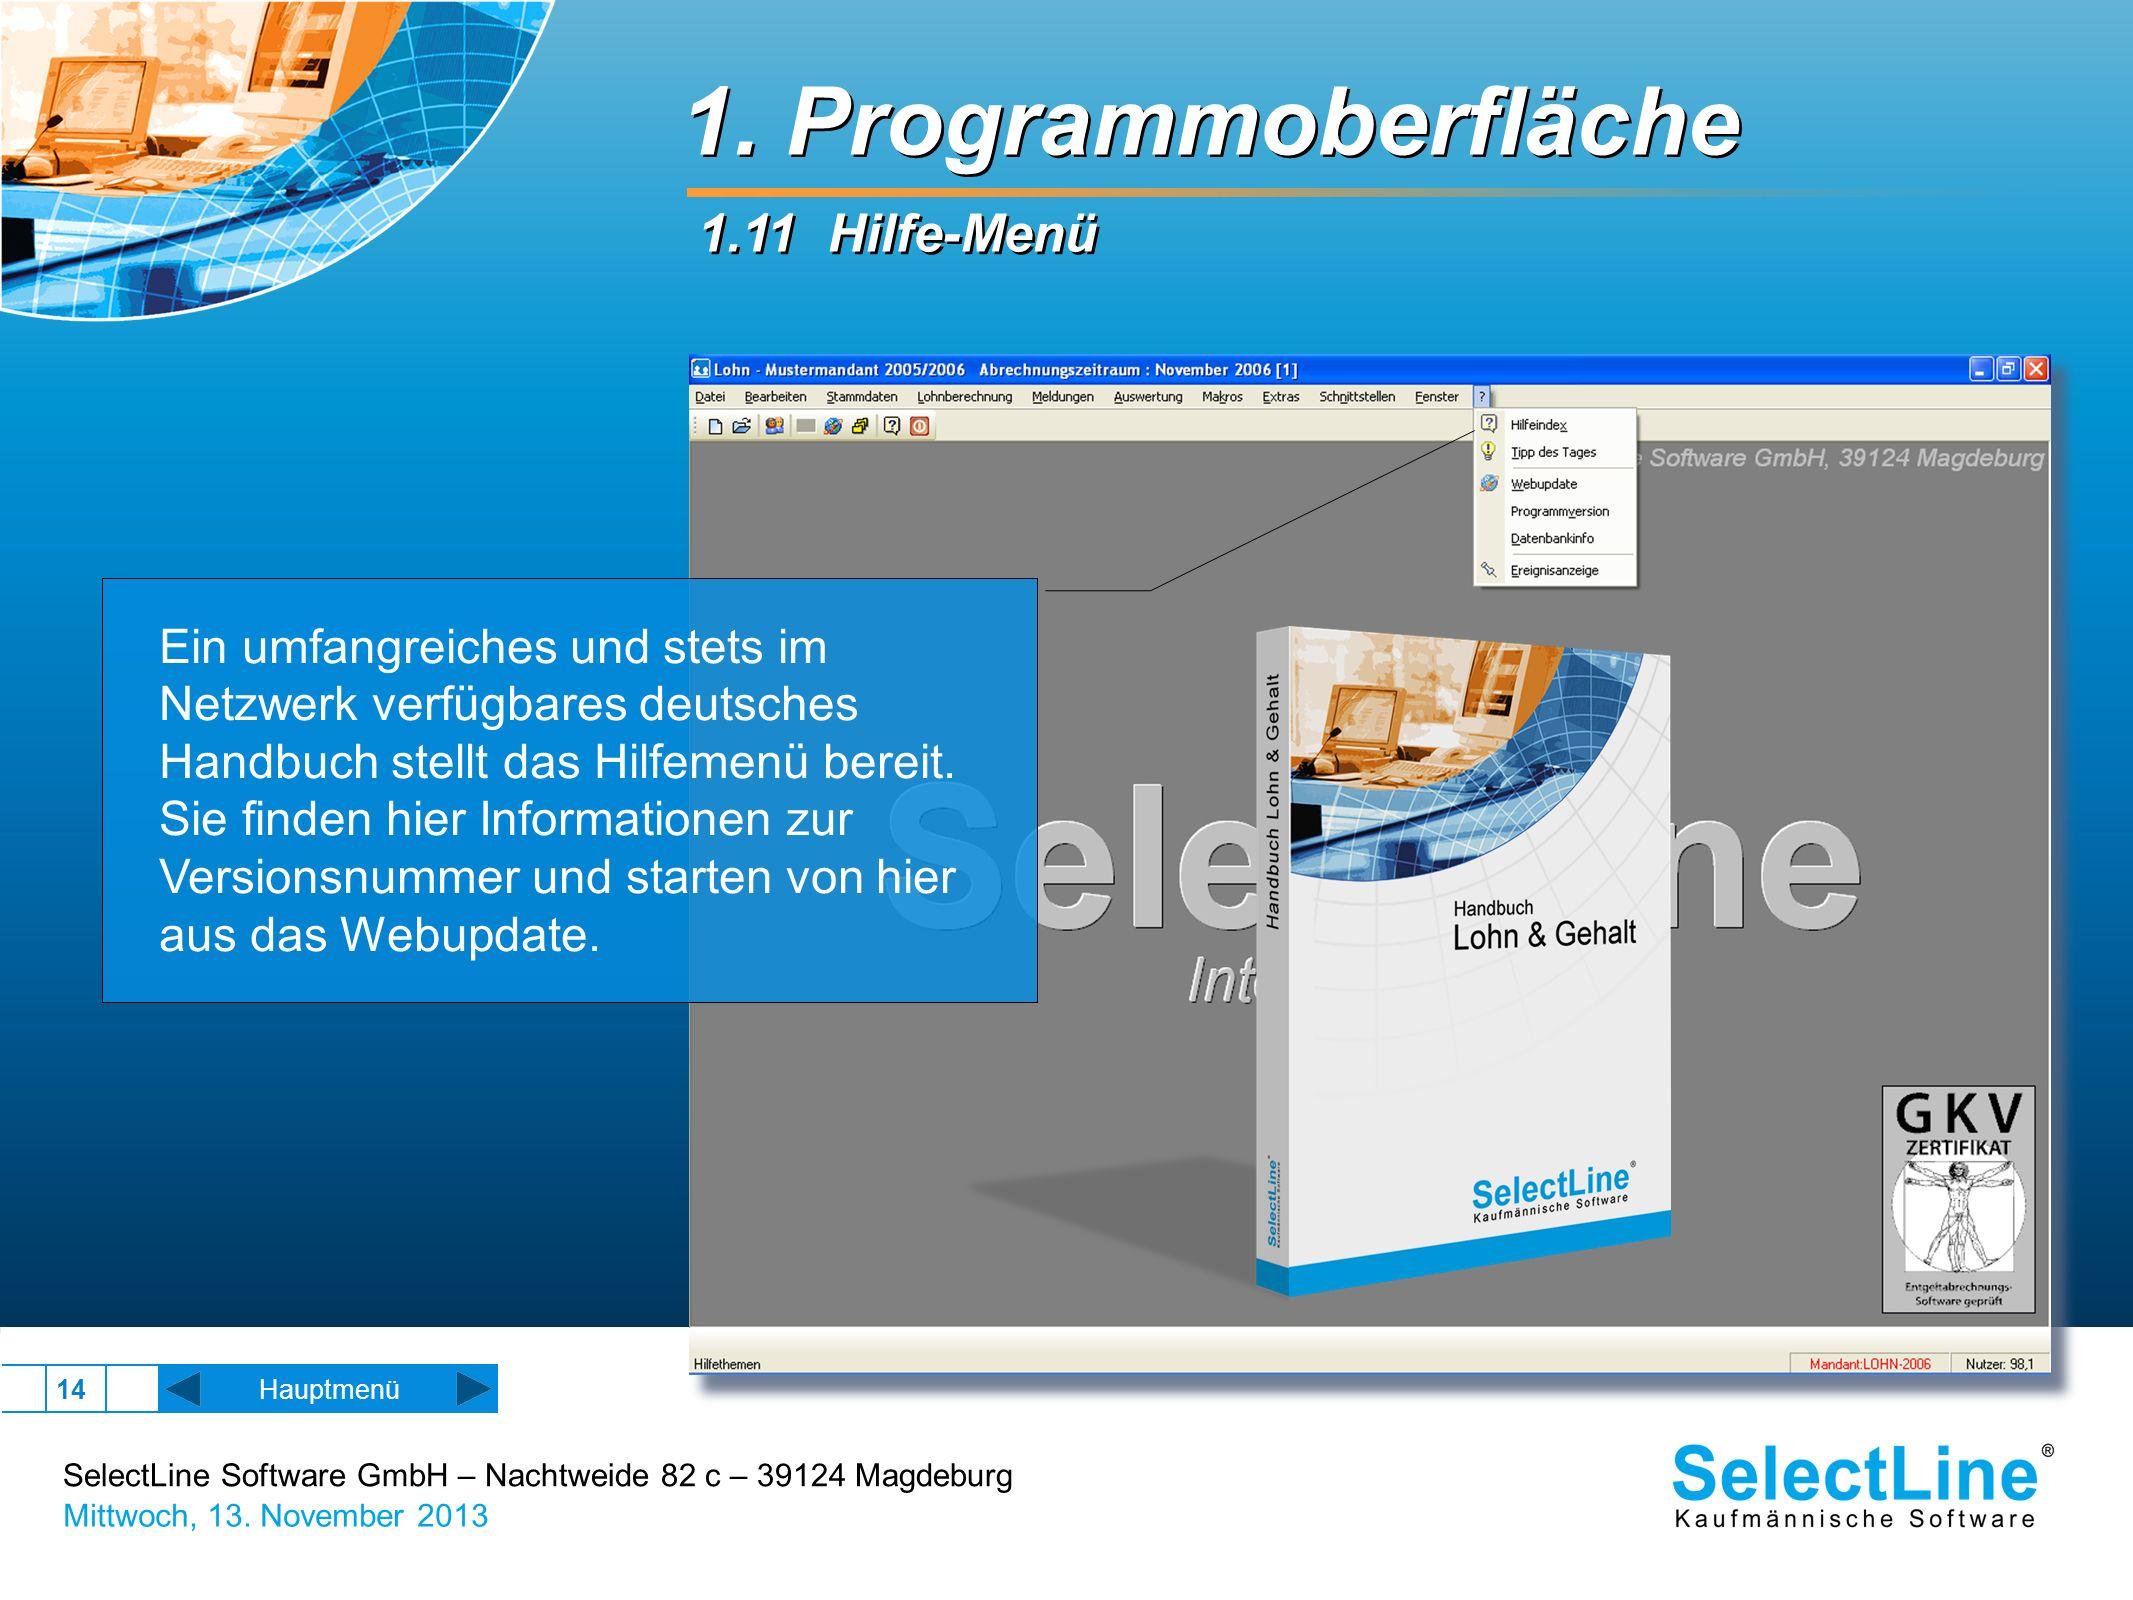 SelectLine Software GmbH – Nachtweide 82 c – 39124 Magdeburg Mittwoch, 13. November 2013 14 1. Programmoberfläche 1.11 Hilfe-Menü Hauptmenü Ein umfang